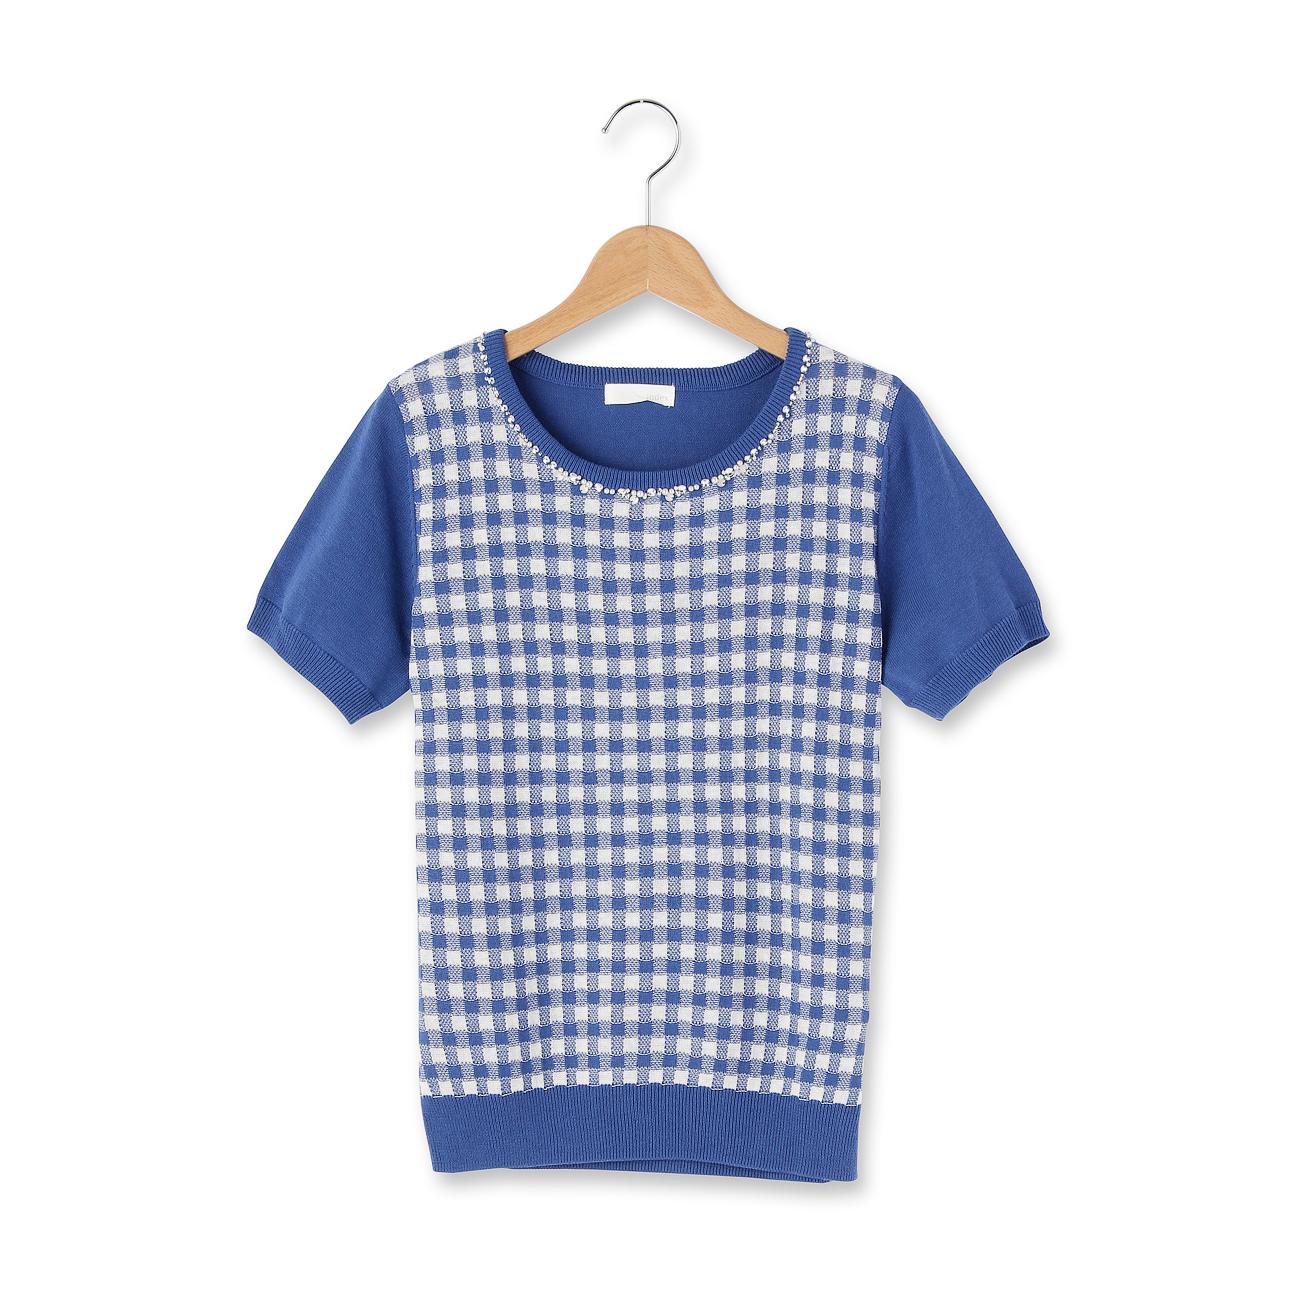 【index (インデックス)】衿ビジューギンガムチェック半袖ニットレディース トップス セーター ブルー